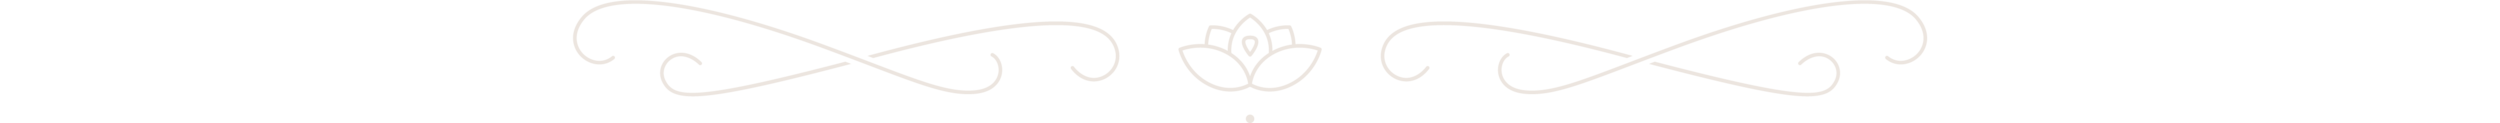 JBT_lotus_divider.png